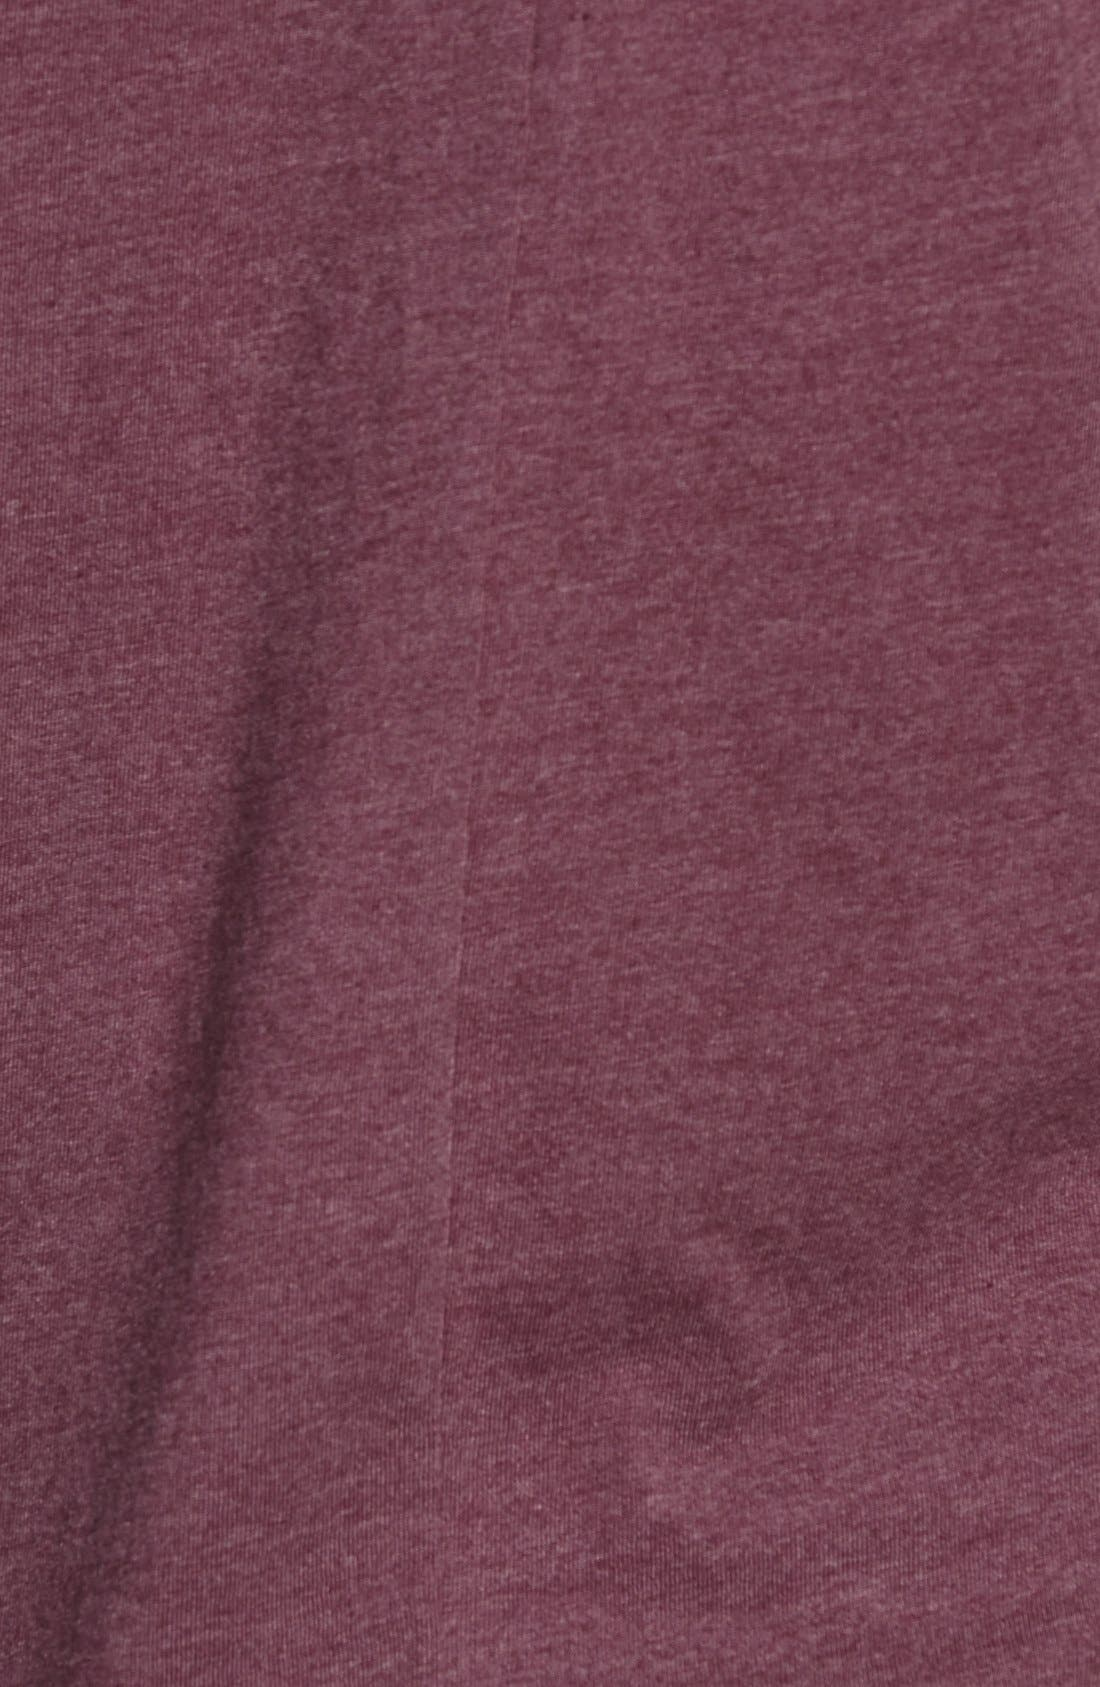 ,                             Scoop Neck Long Sleeve Tee,                             Alternate thumbnail 68, color,                             930